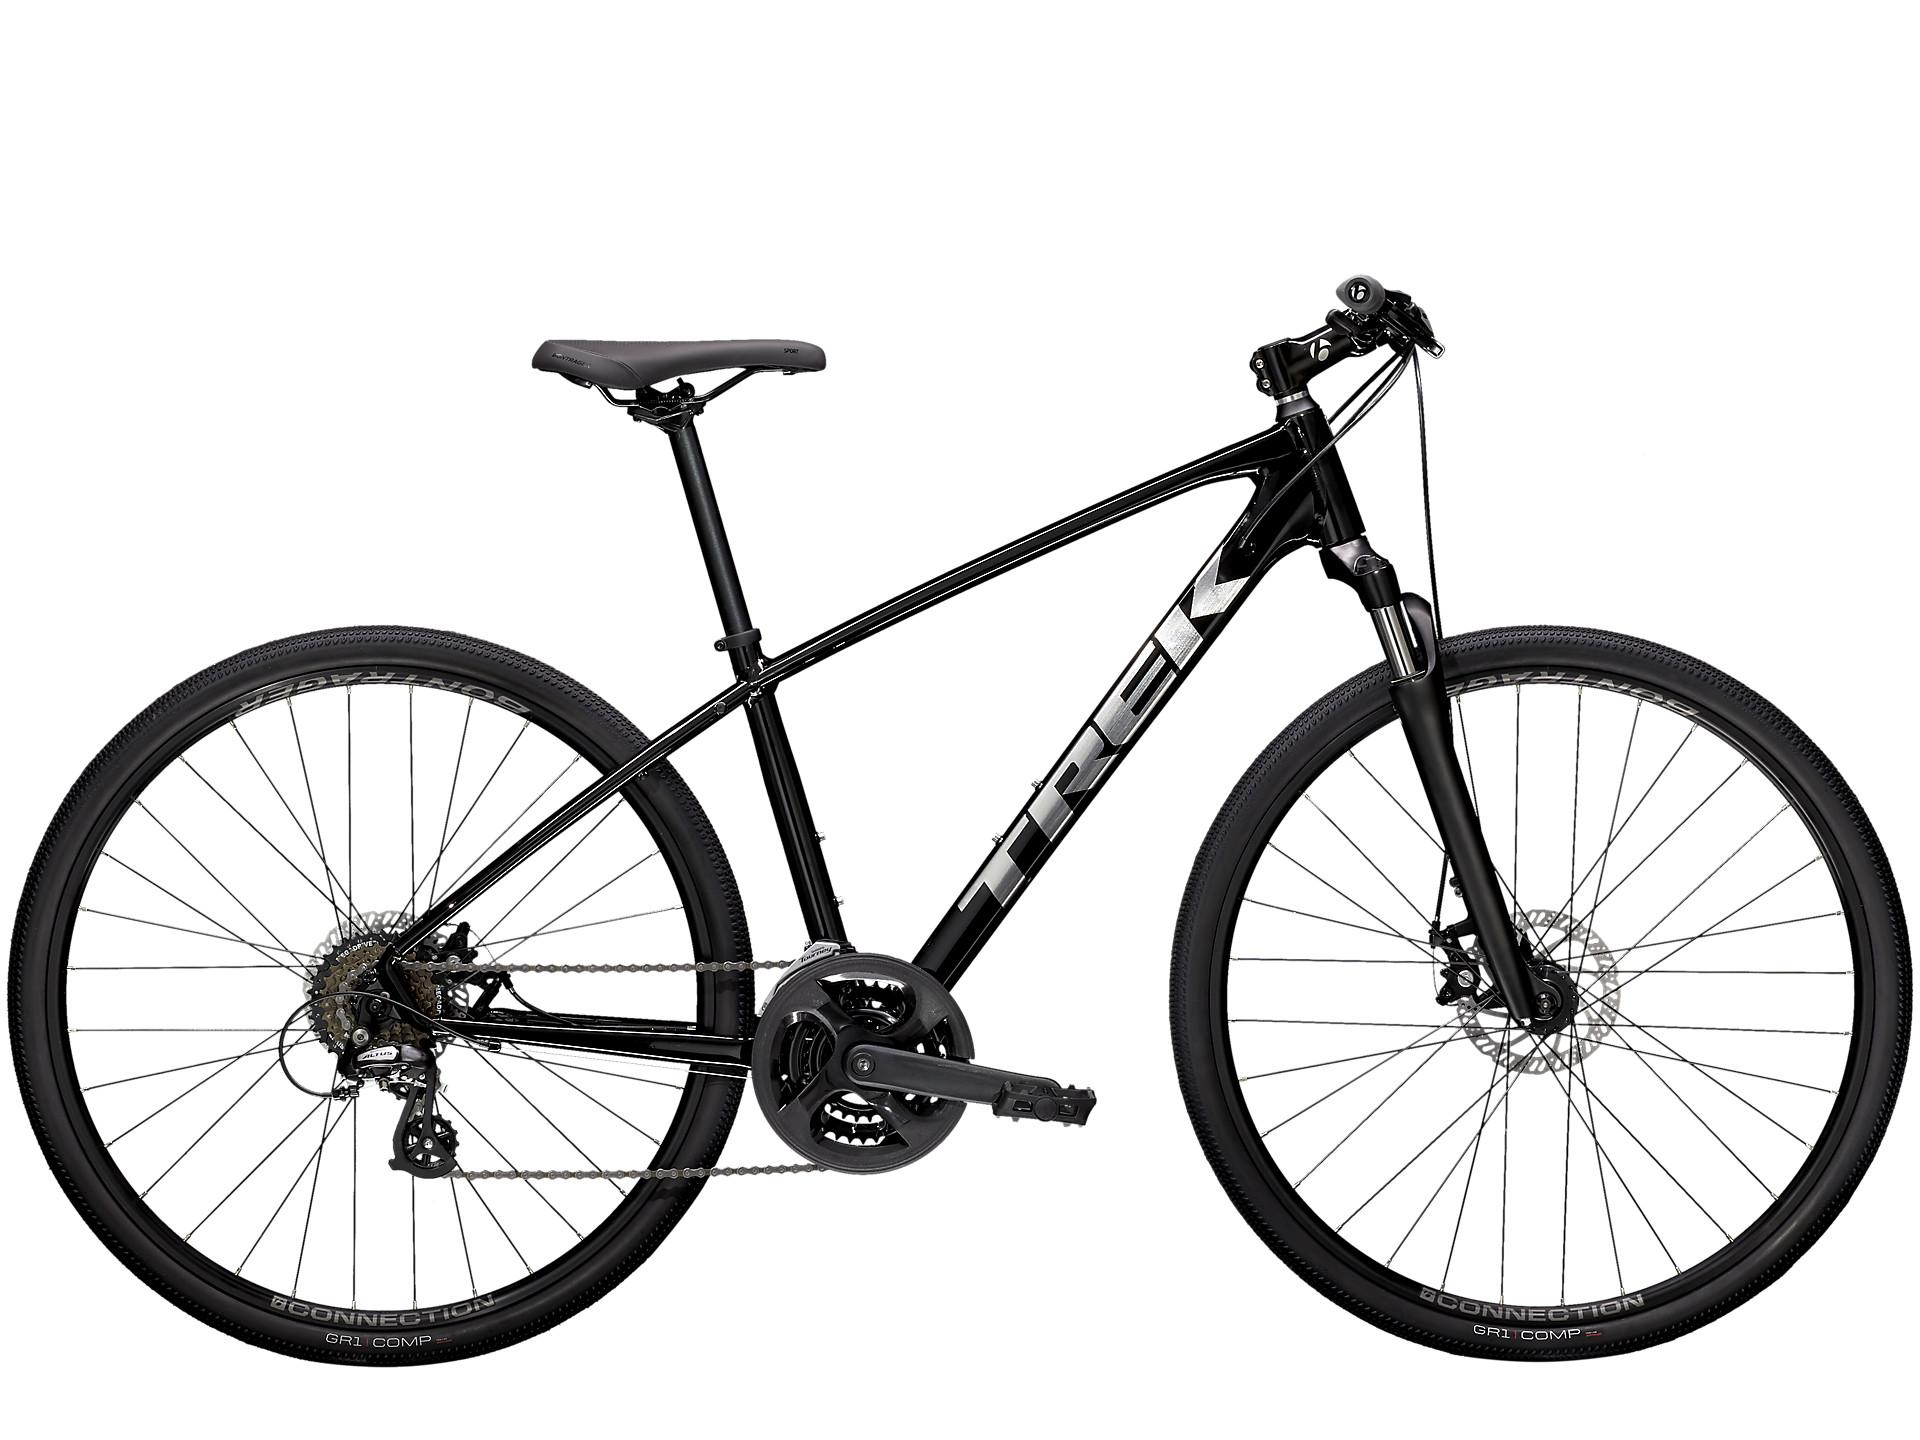 new black hybrid bike